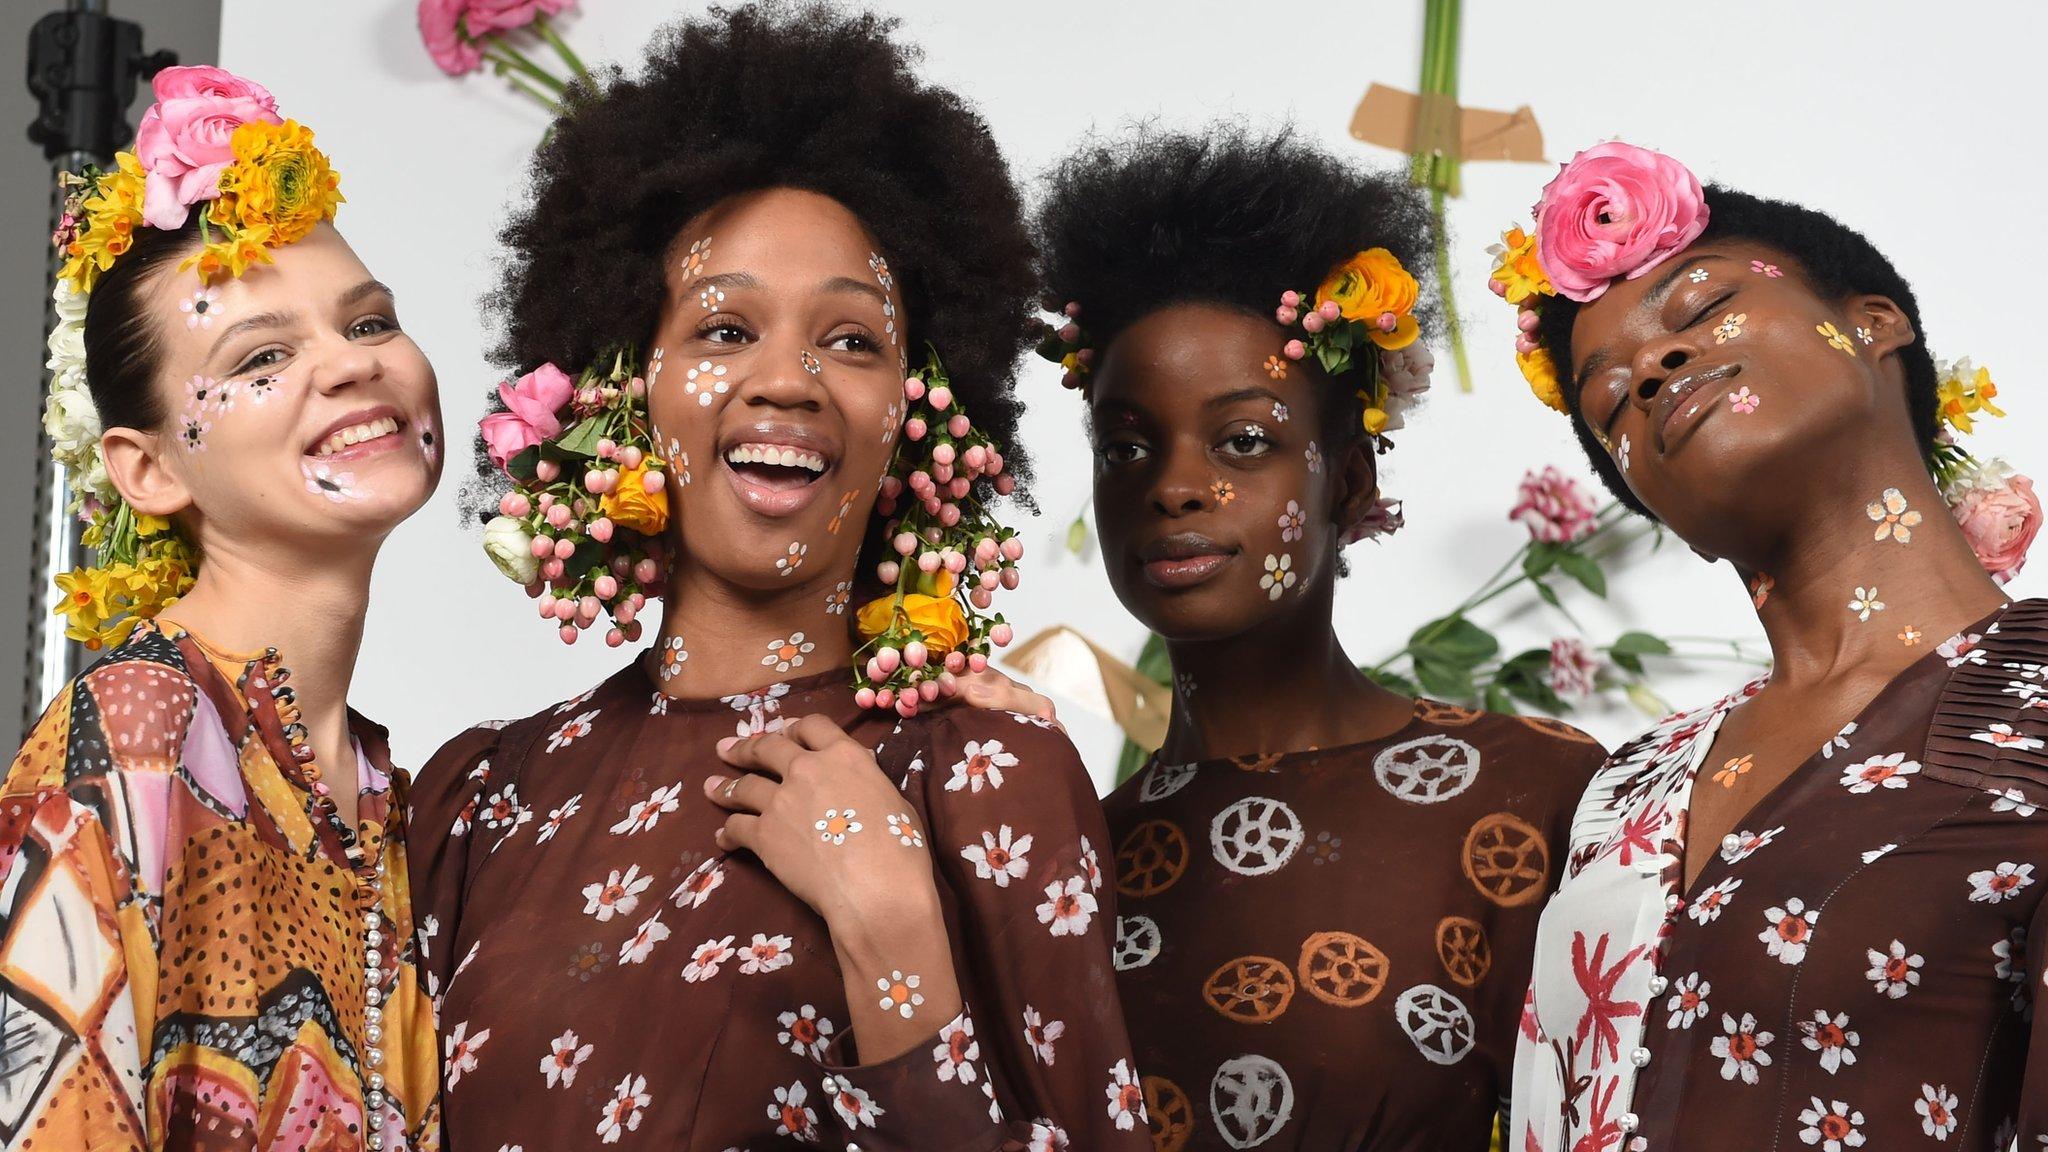 London Fashion Week: The highlights